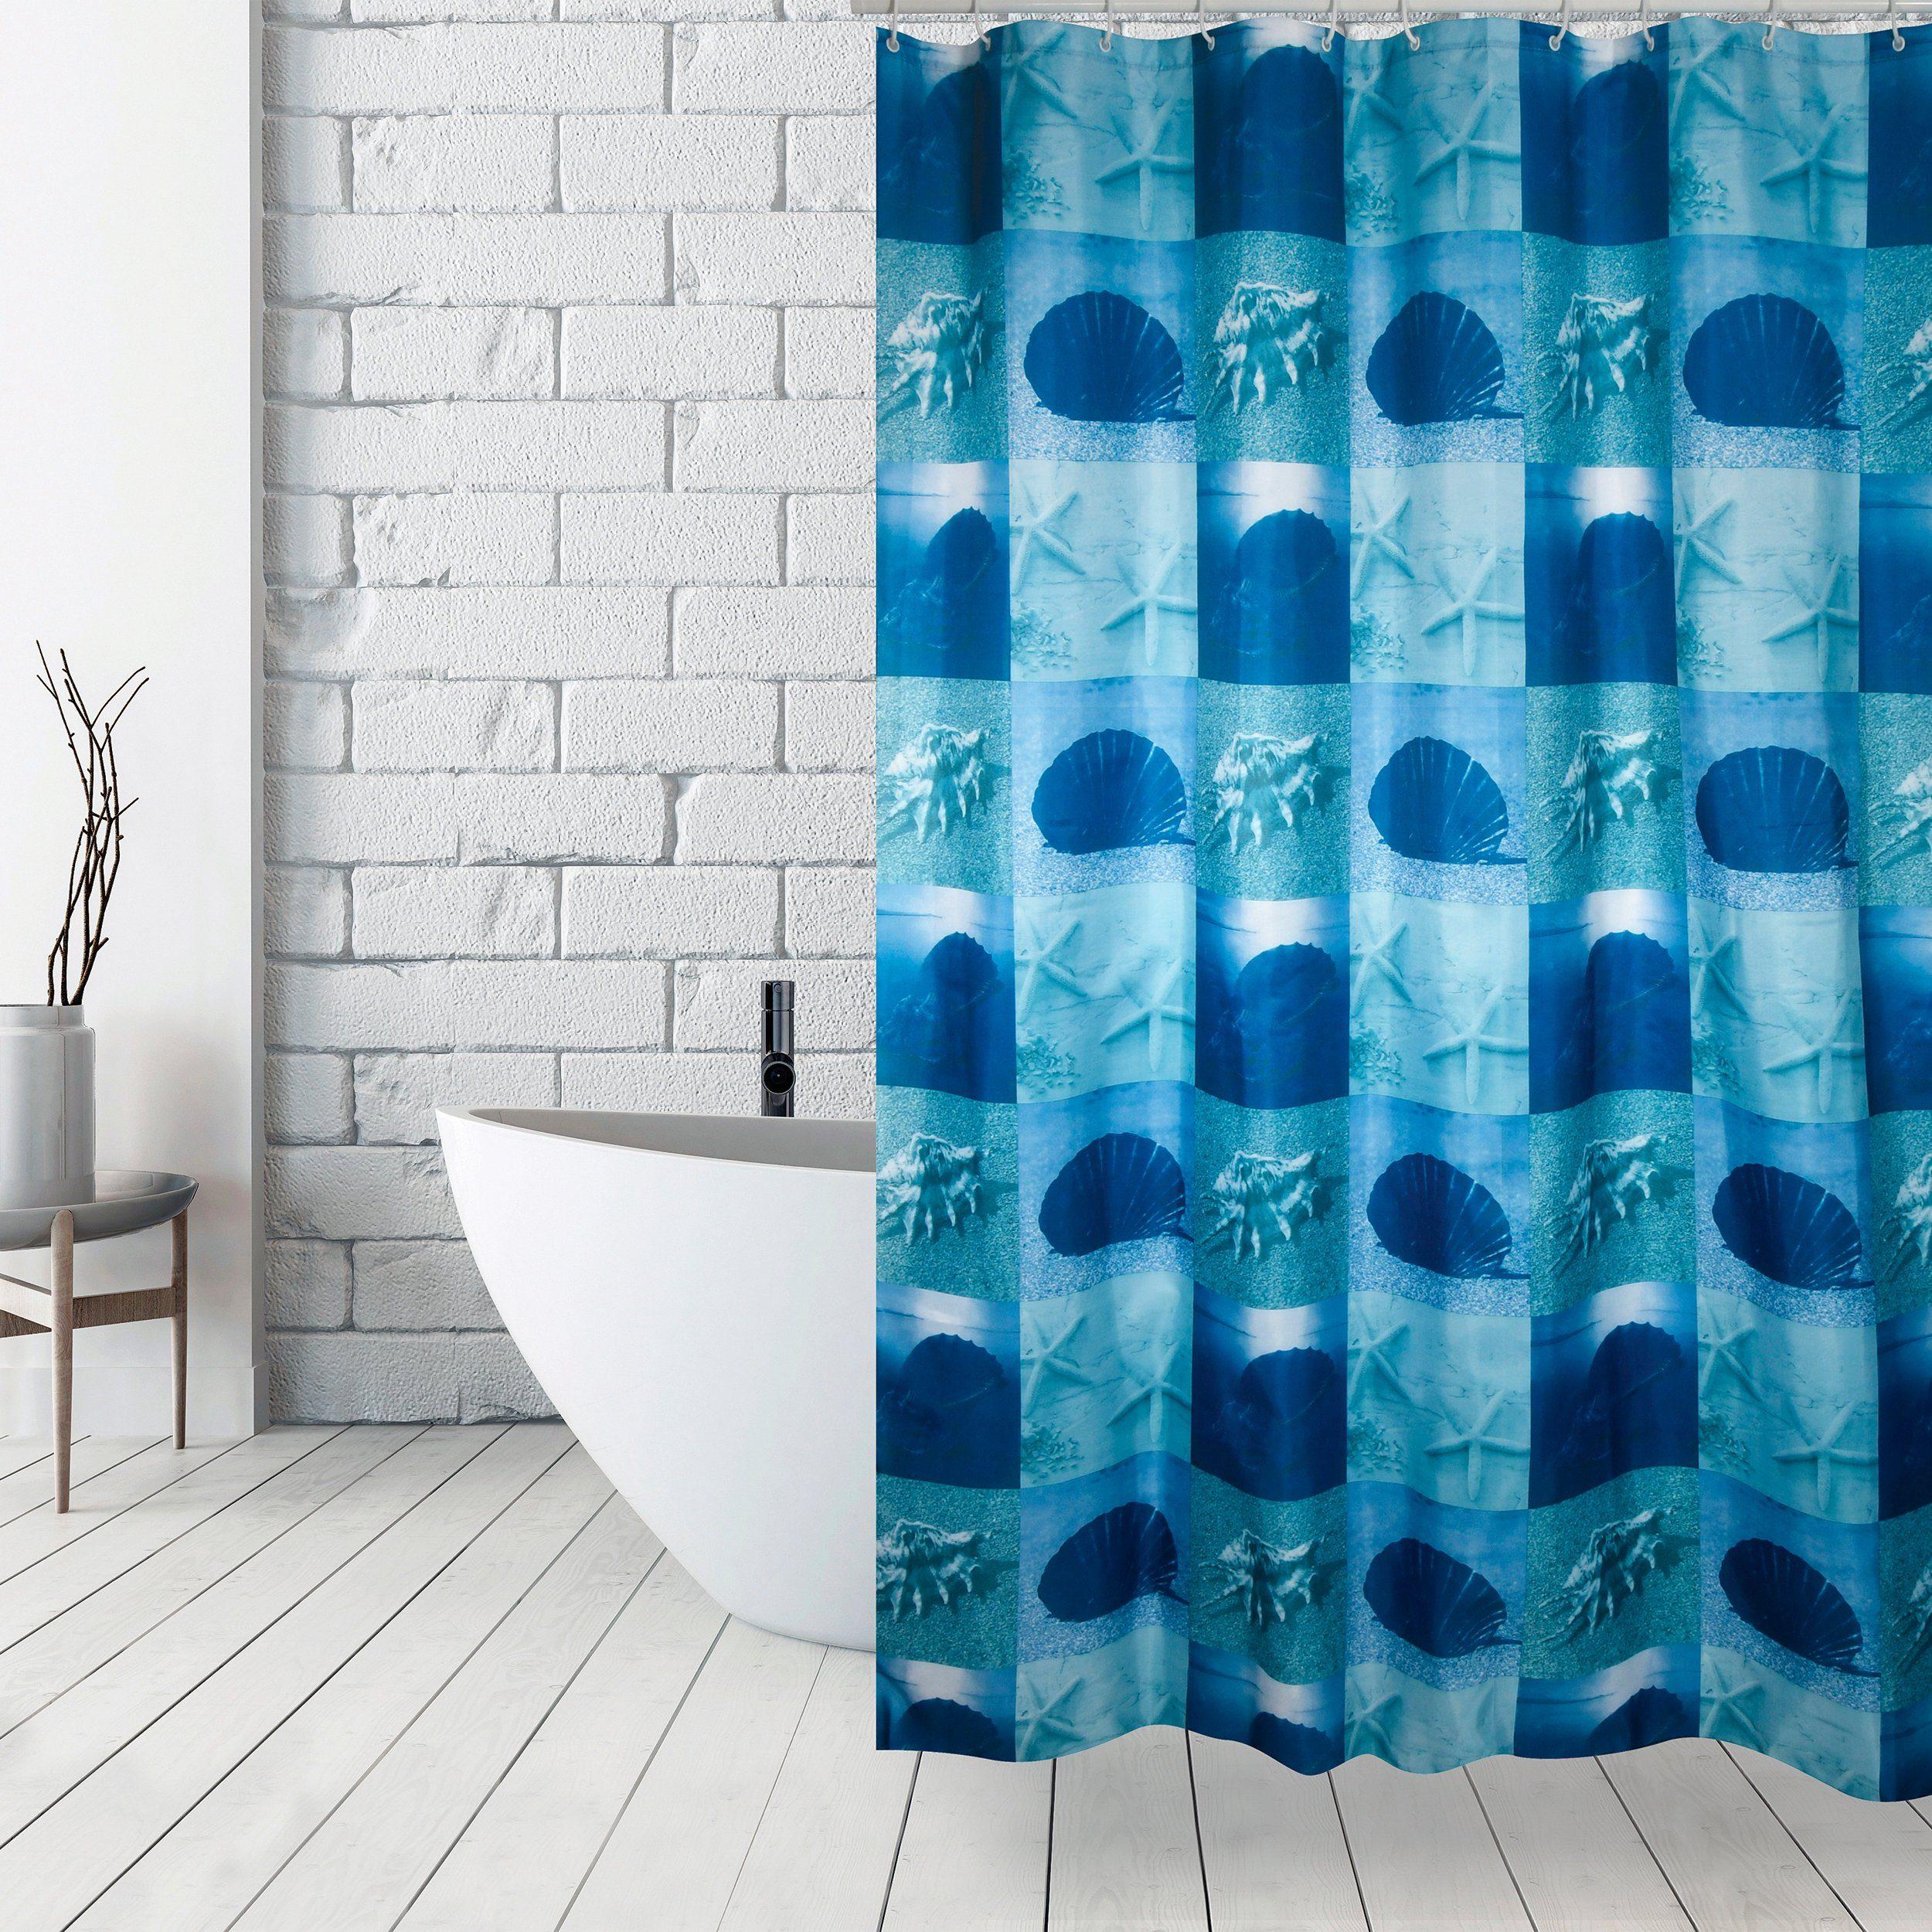 MSV Duschvorhang 180x200cm Anti Schimmel Textil Badewannenvorhang Wannenvorhang Muschel